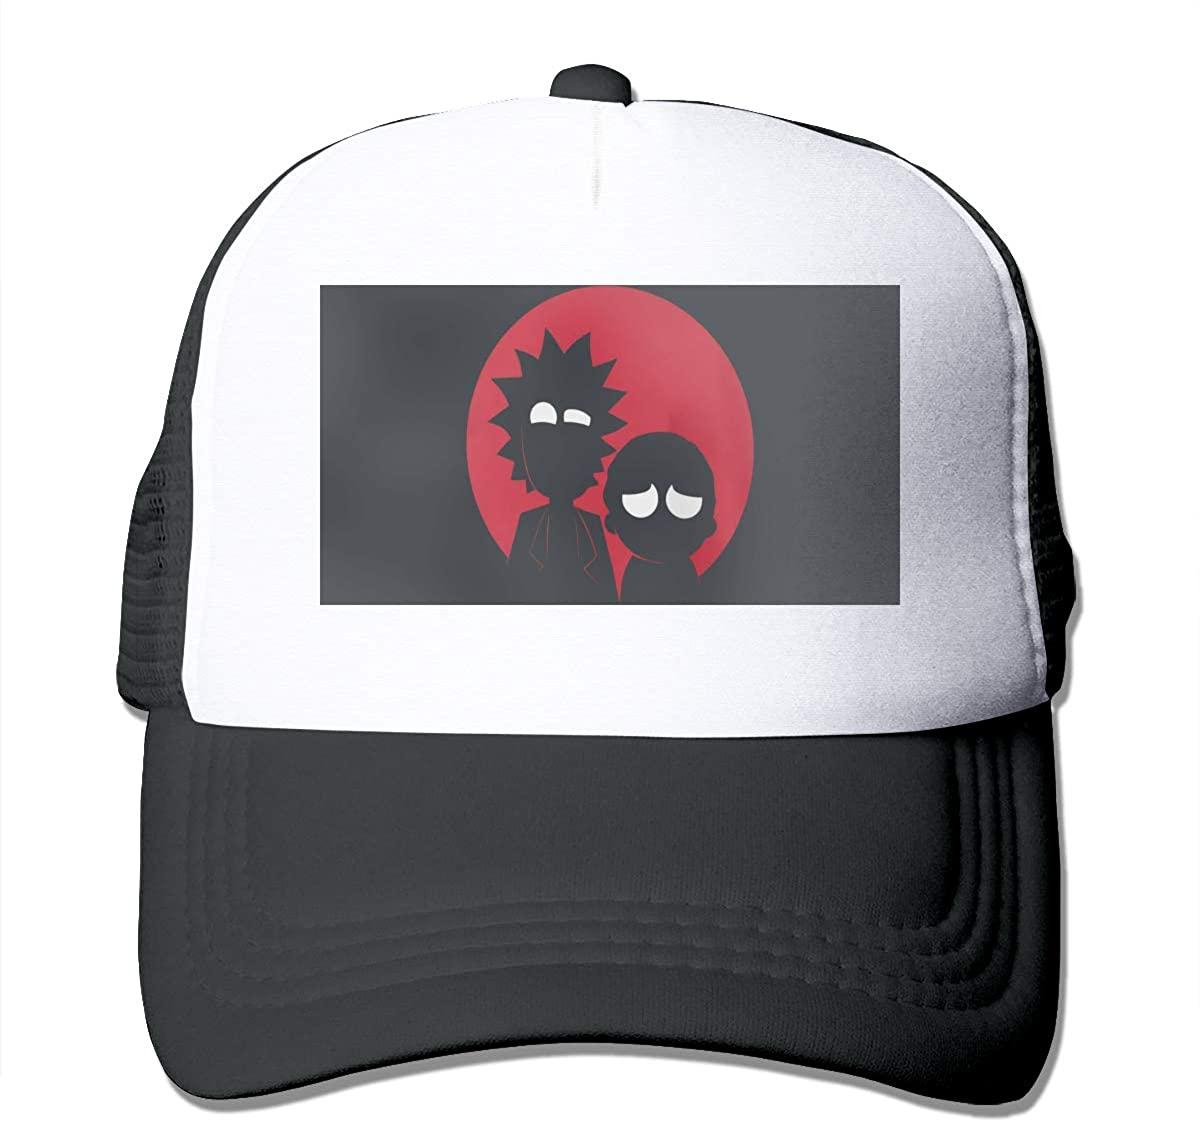 Cbjdsu-CNDSJH Rick and Moti Unisex Trucker Hats Adjustable Hat Chapeau